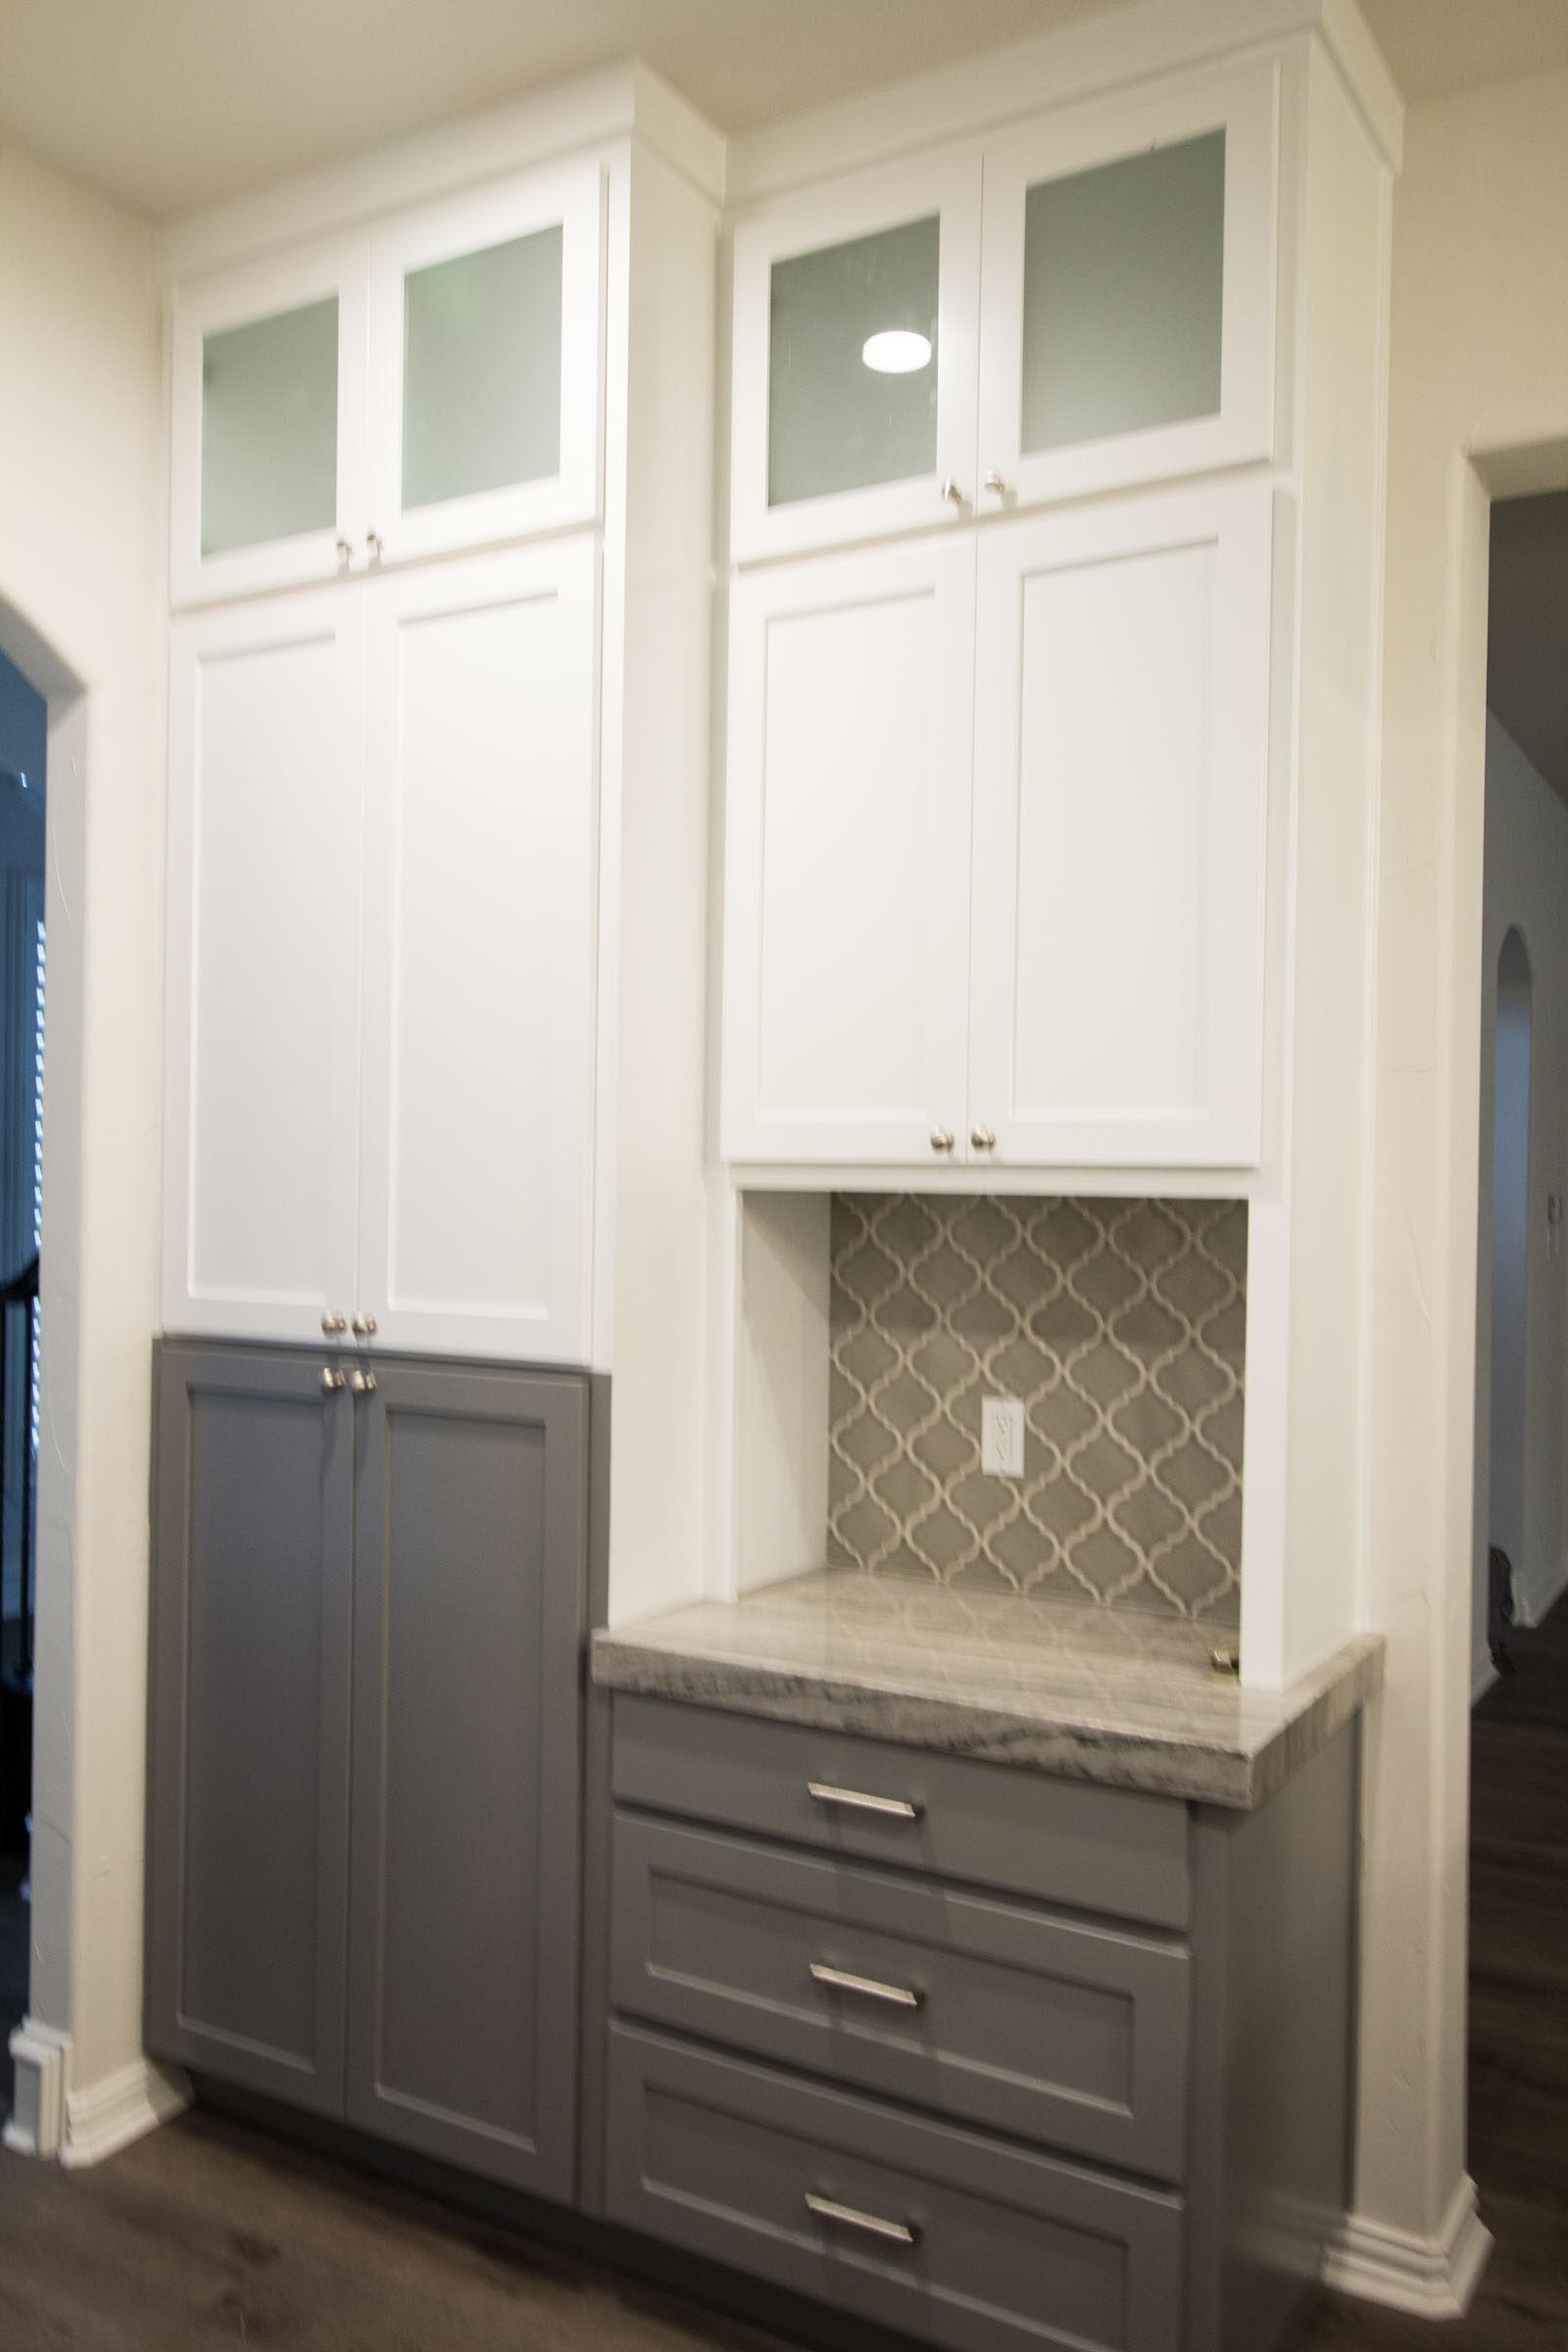 Contemporary kitchen remodel, white upper cabinets, grey lower cabinets, multicolor cabinets, grey glass arabesque backsplash